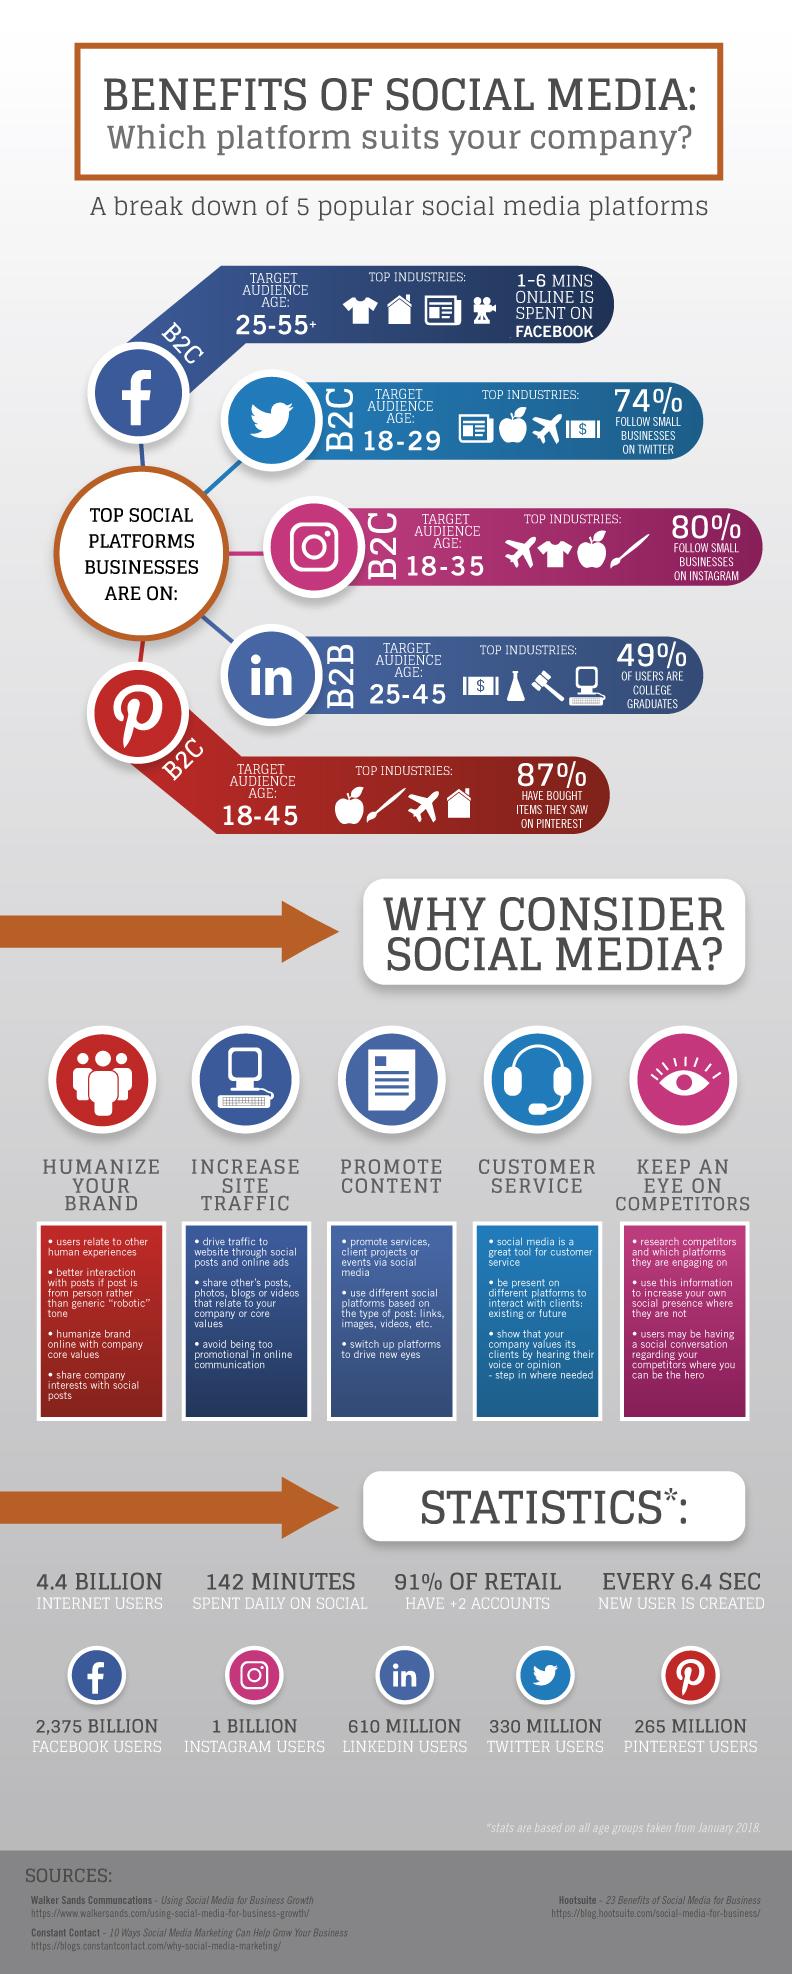 Social-media-infographic-2